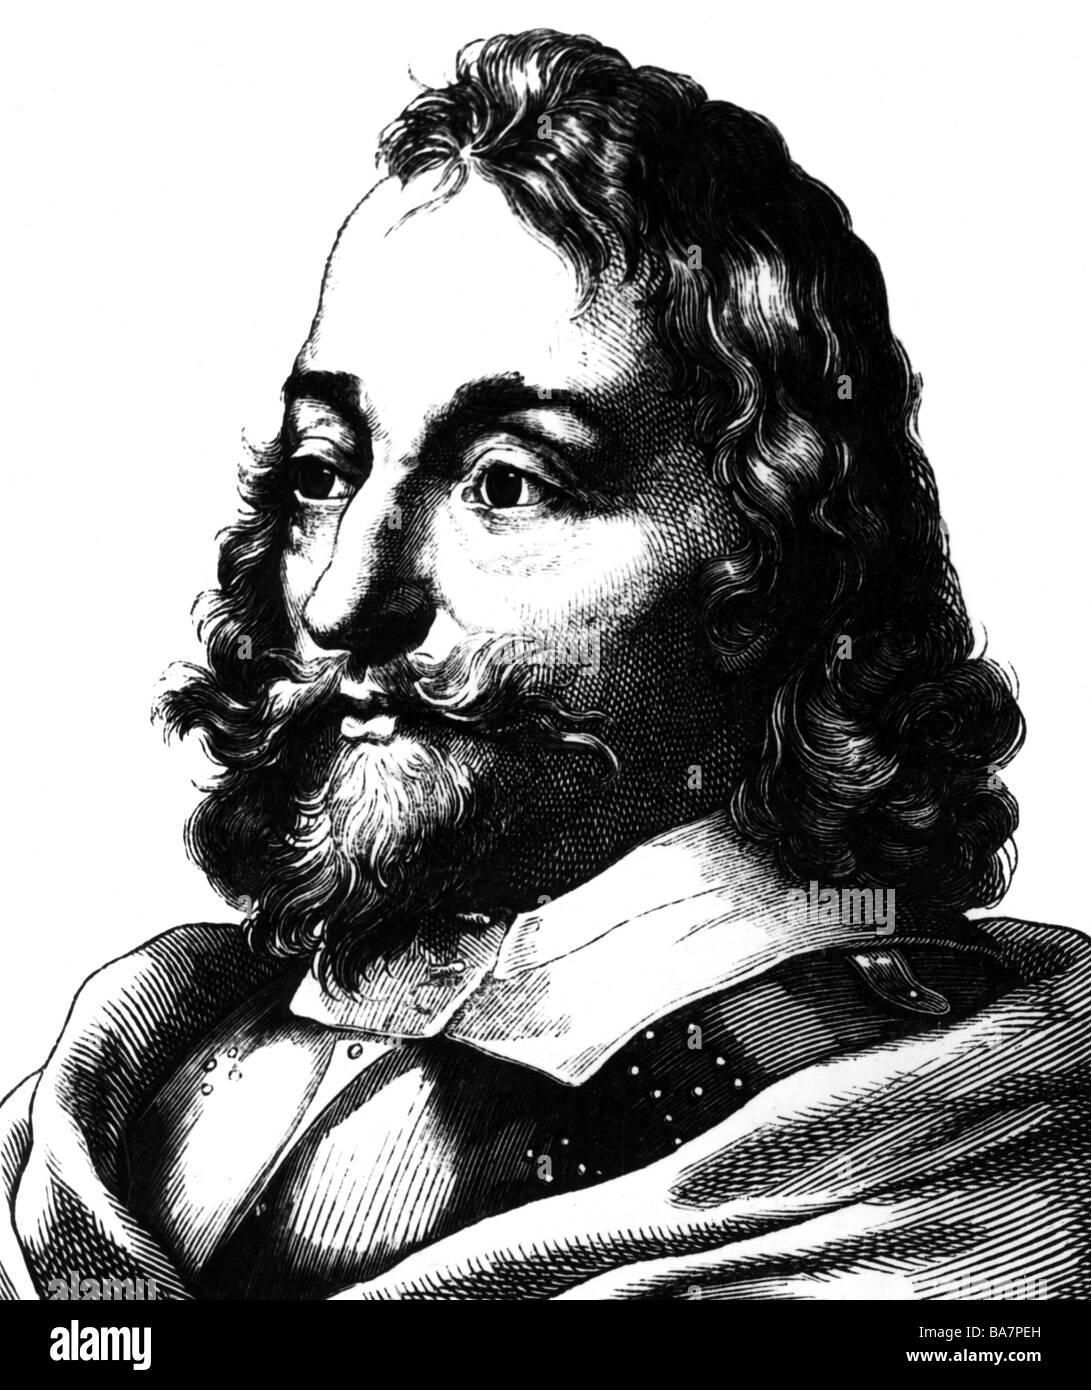 Maximilian I., 17.4.1573 - 27.9.1651, Herzog von Bayern 15.10.1597 - 27.9.1651, Kurfürst 25.2.1623 - 27.9.1651, Stockbild